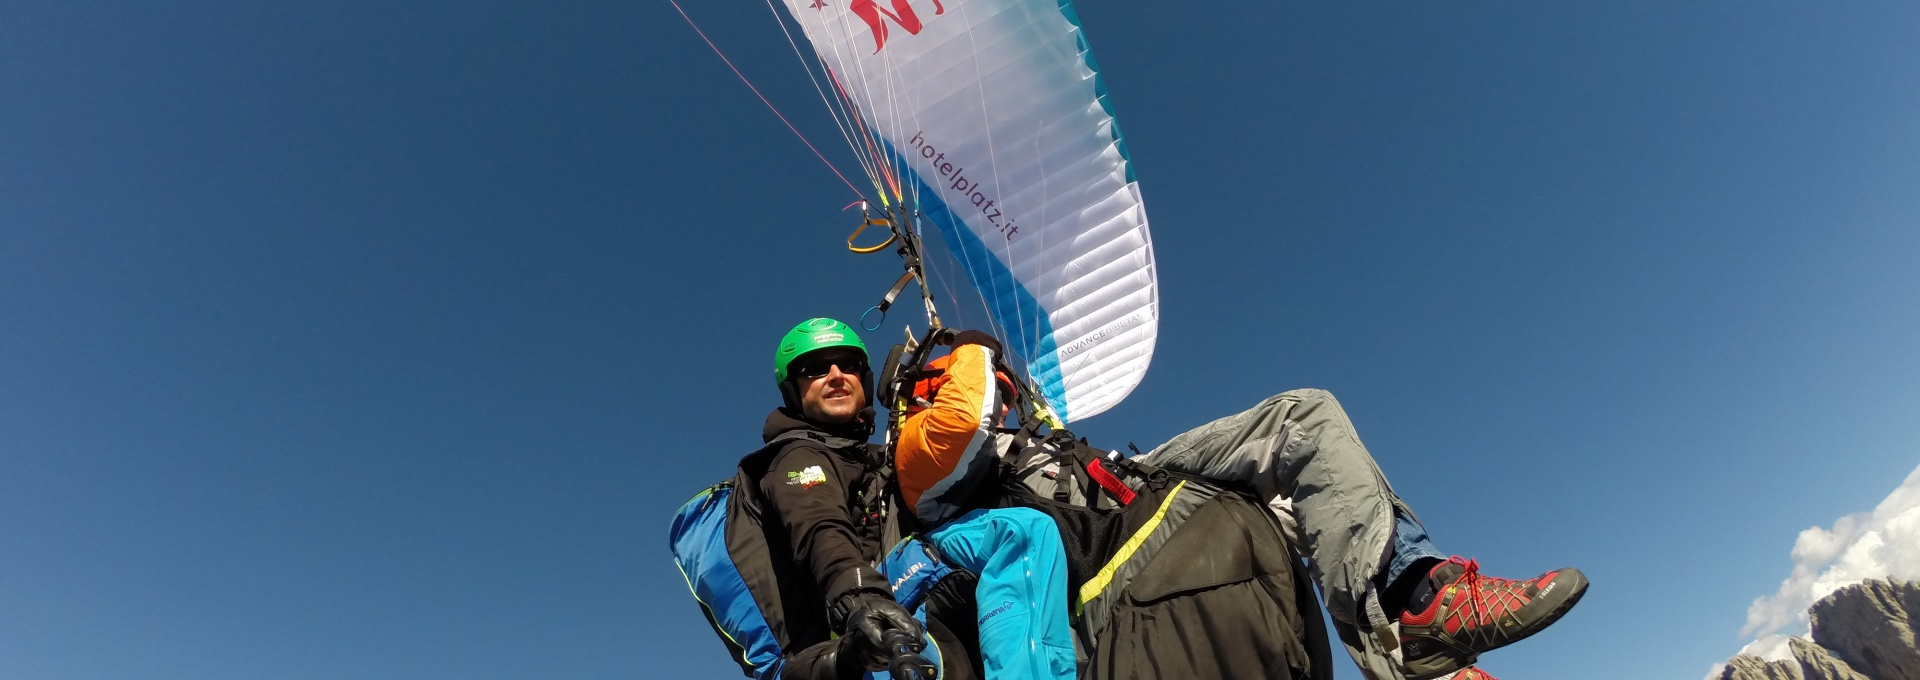 over Sassolungo - Dolomiti